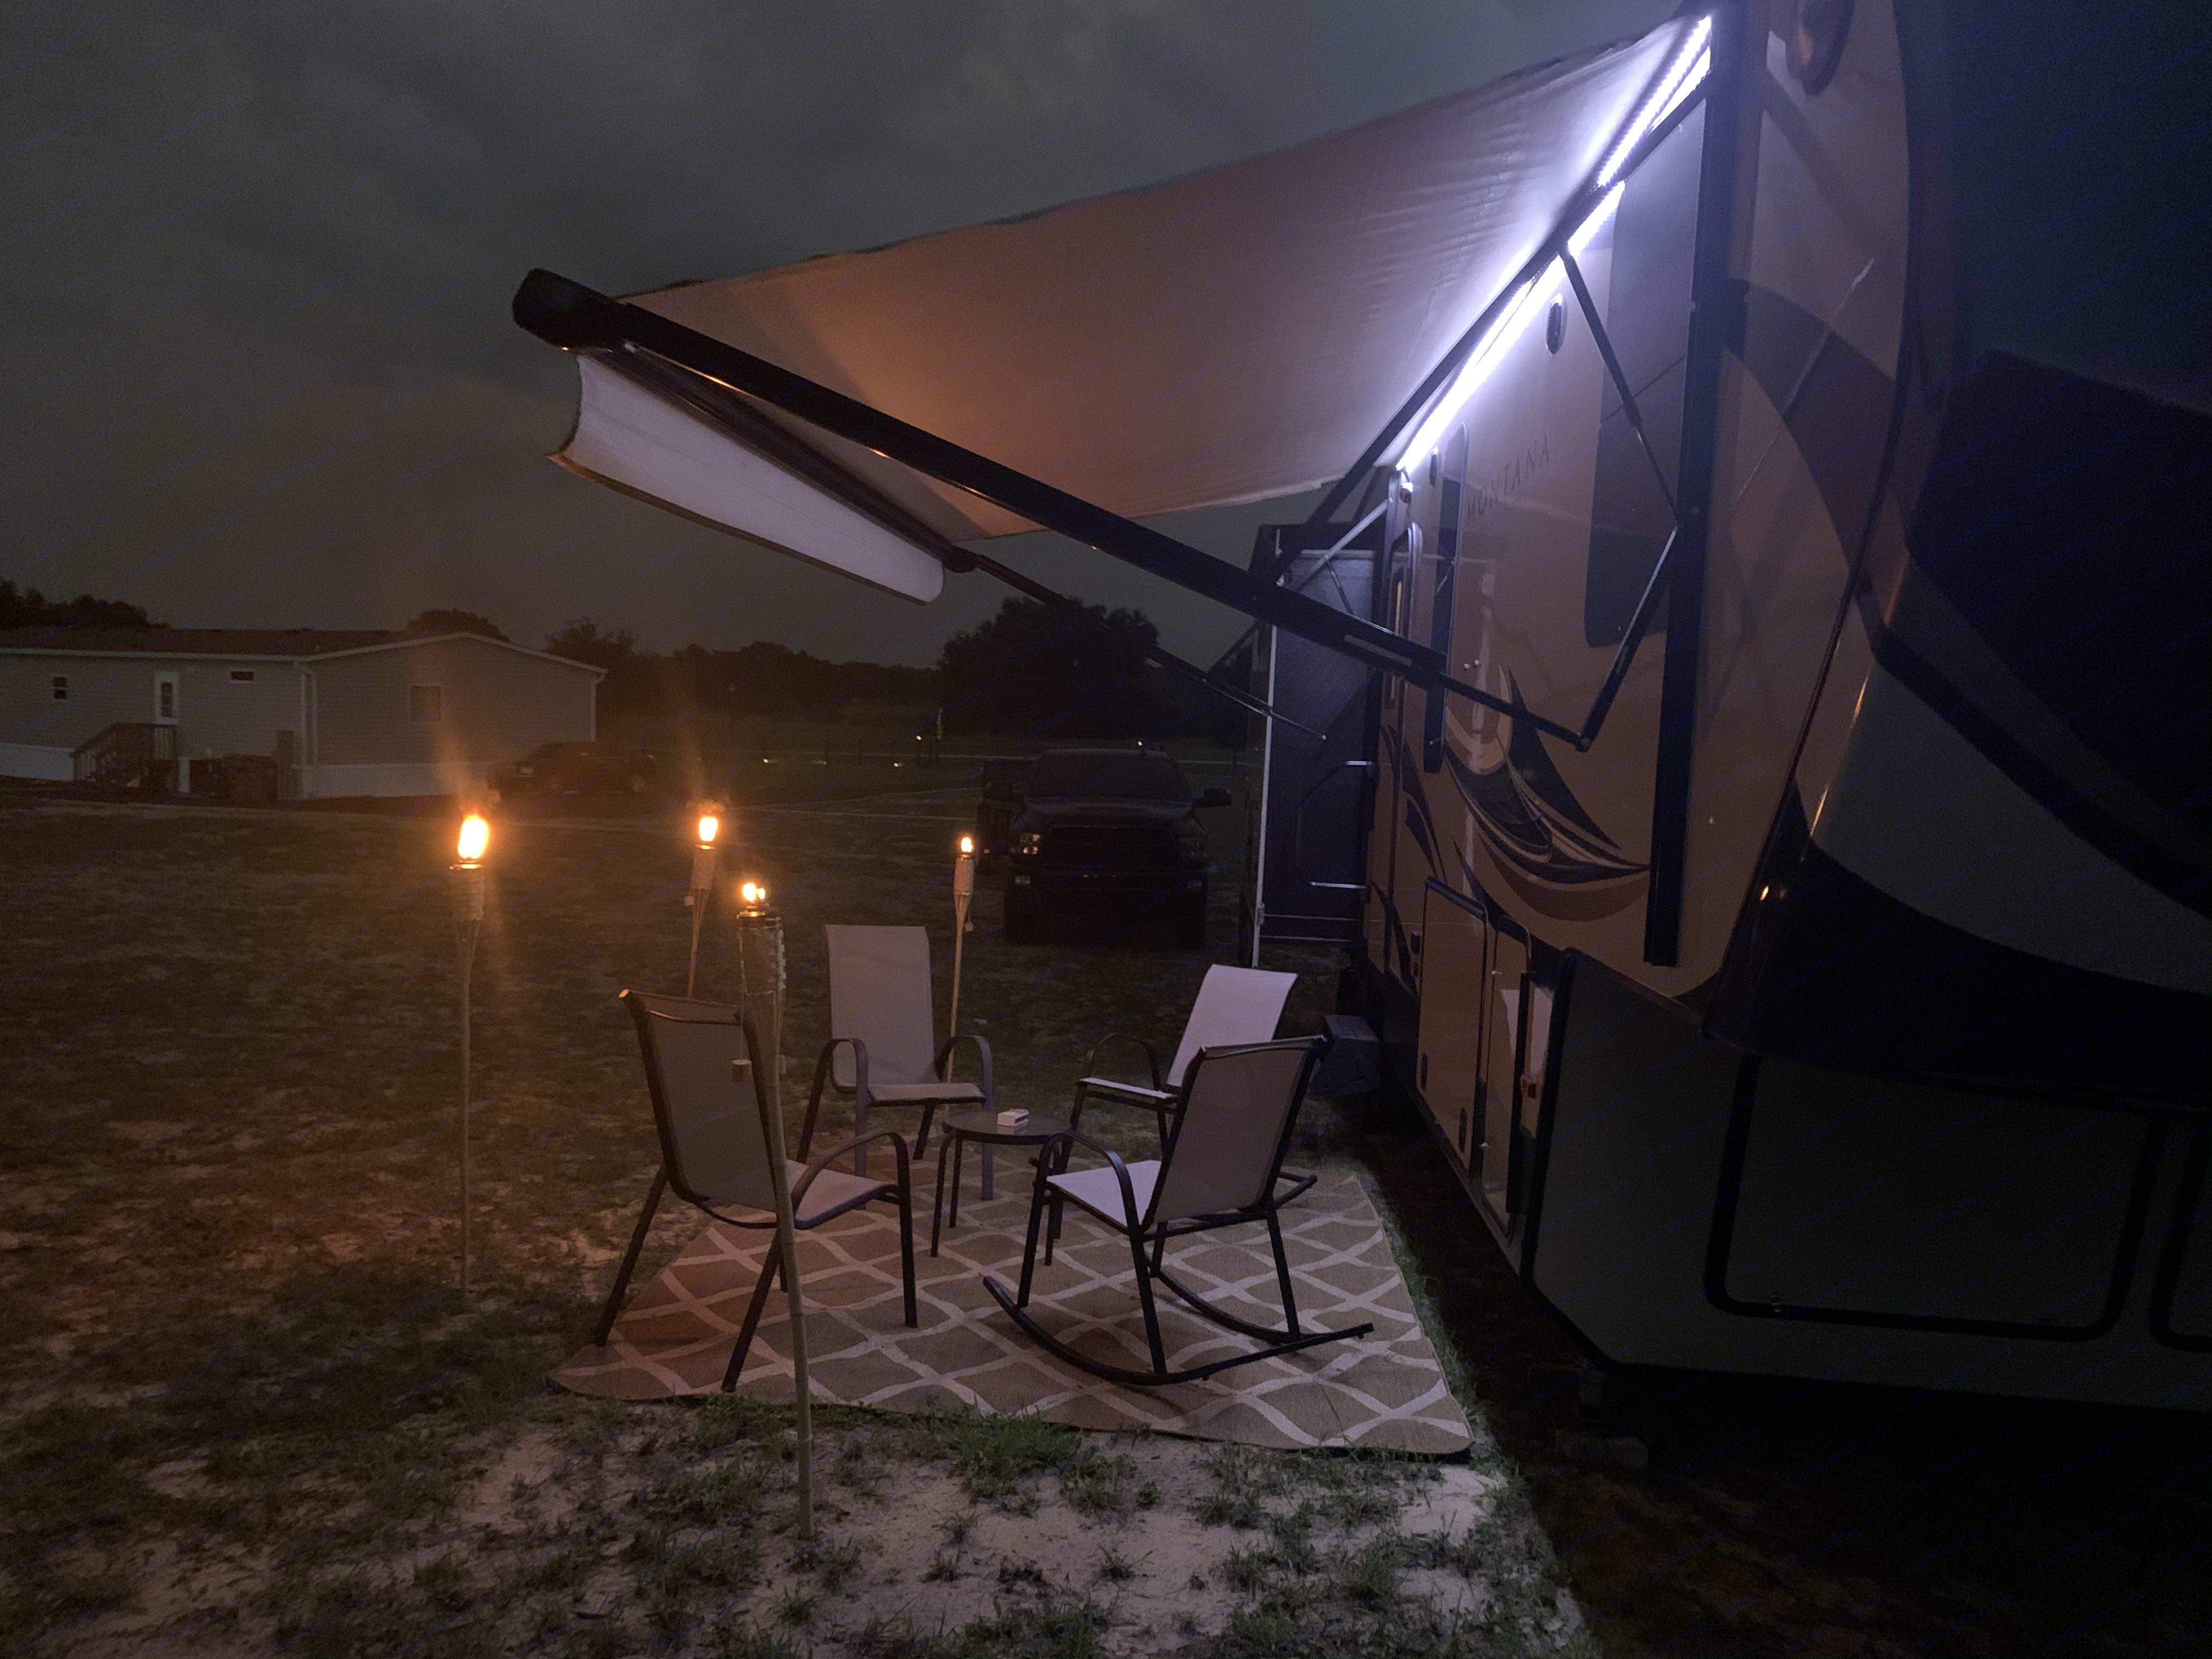 Night Time Camping. Keystone Montana High Country 2018